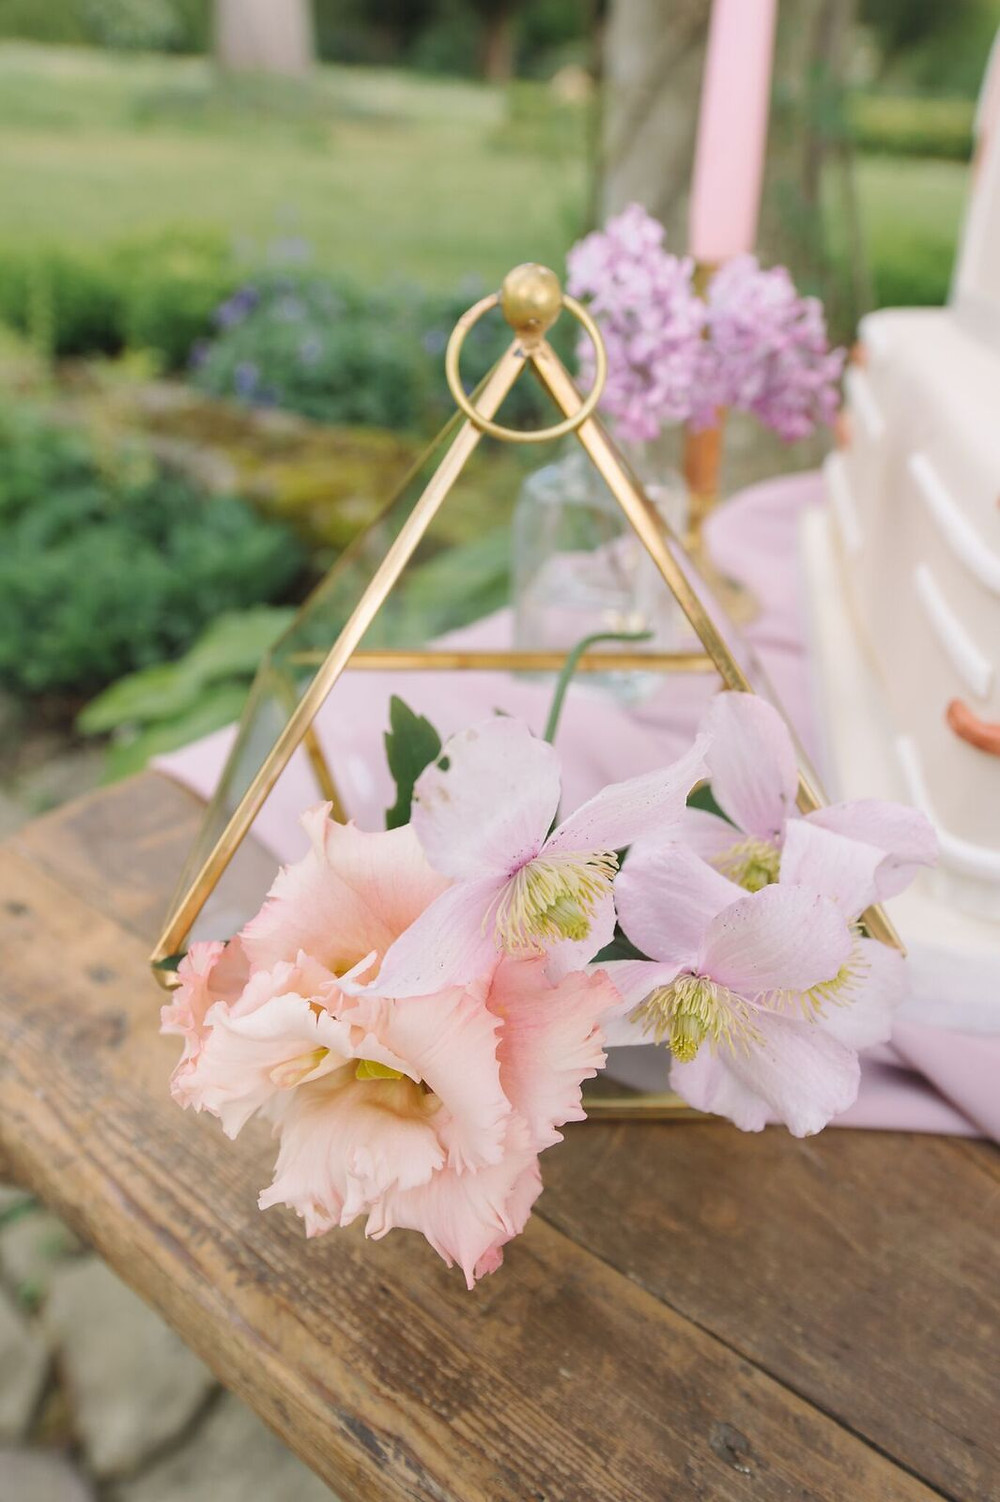 Gold Terrarium with Pastel Flowers